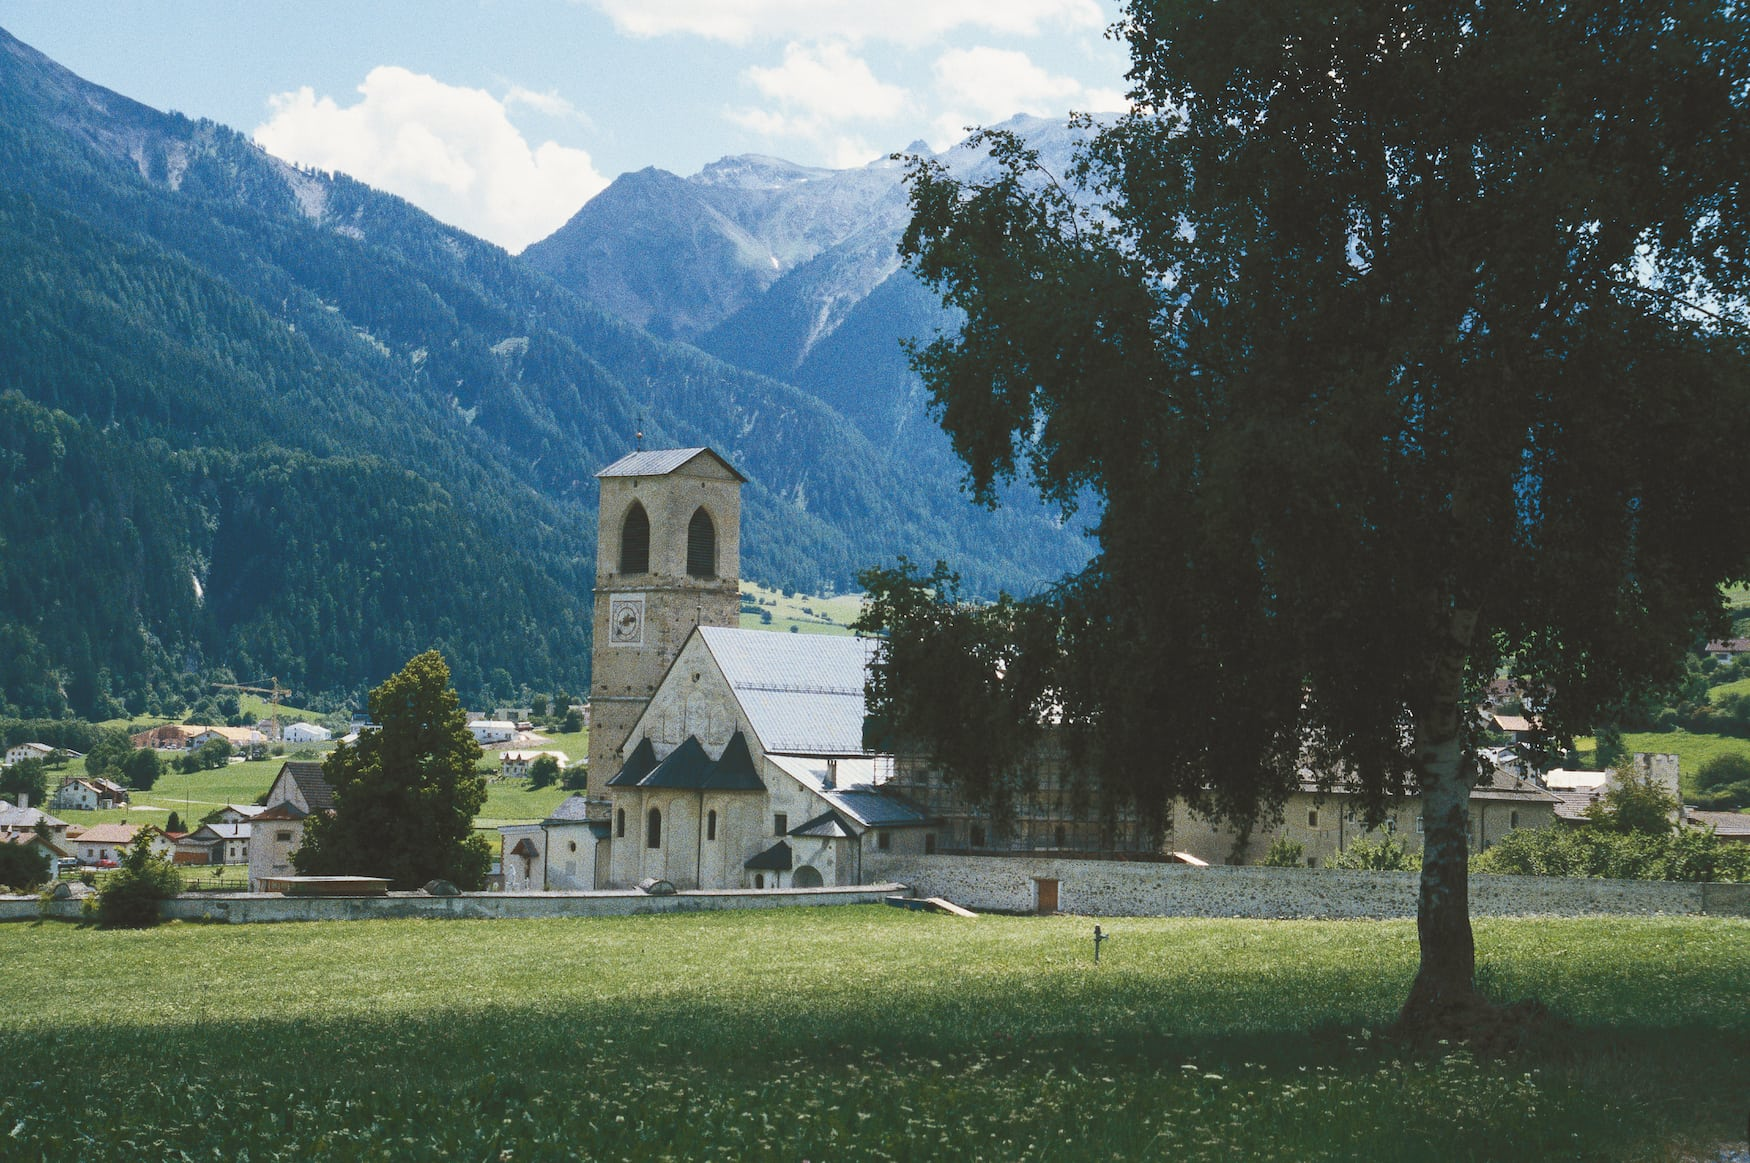 Kloster St. Johann, UNESCO Weltkulturerbe in Muestair, Schweiz